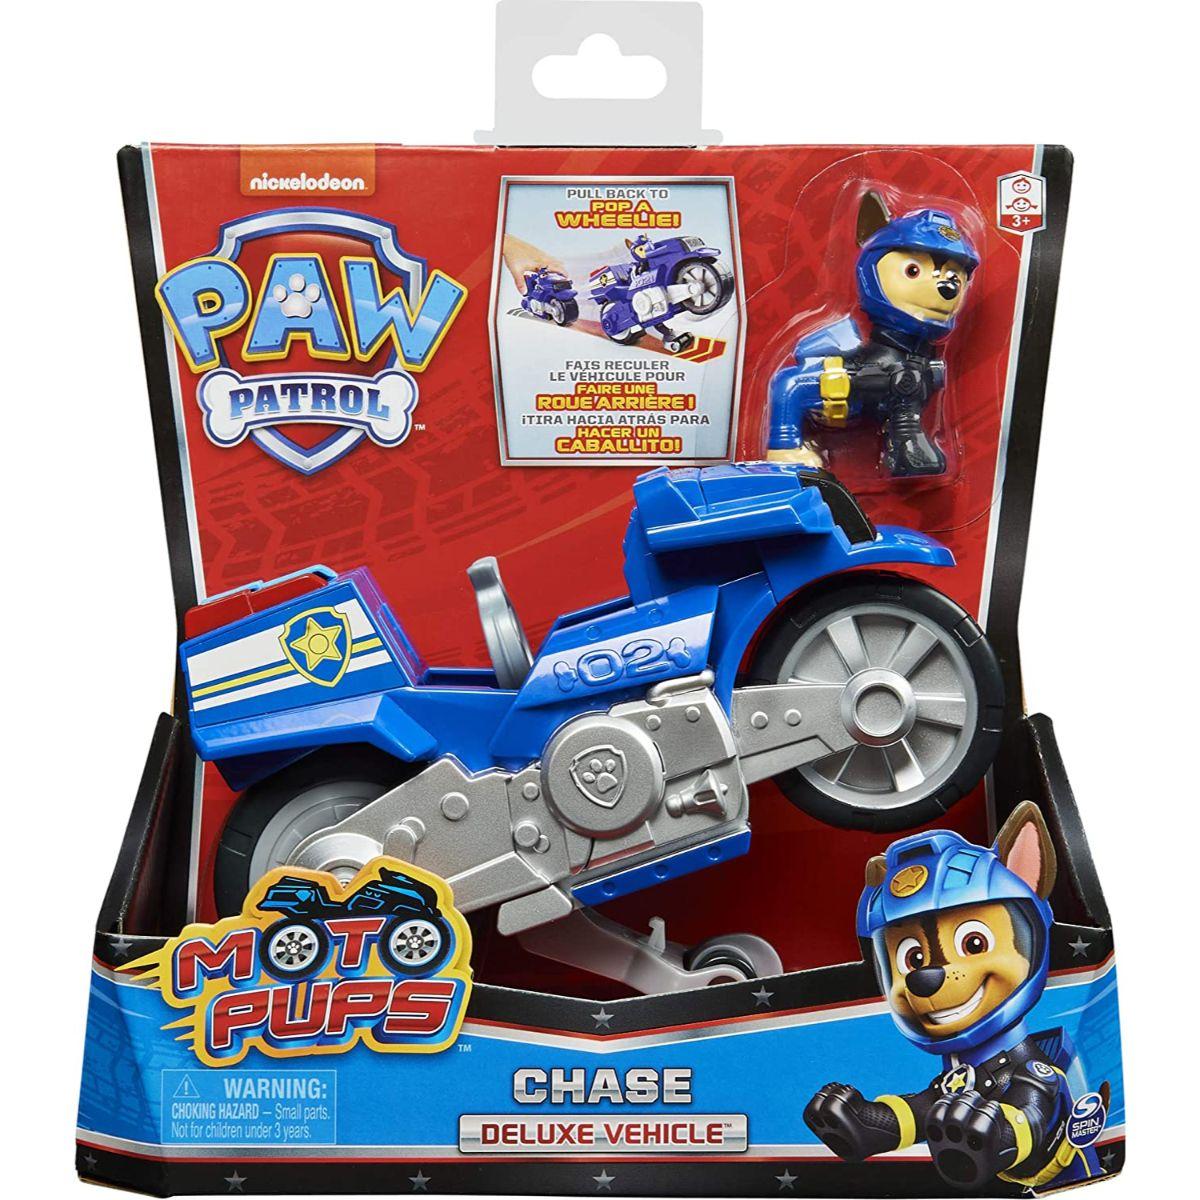 Motocicleta si figurina Paw Patrol Moto Pups, Chase, 20127783